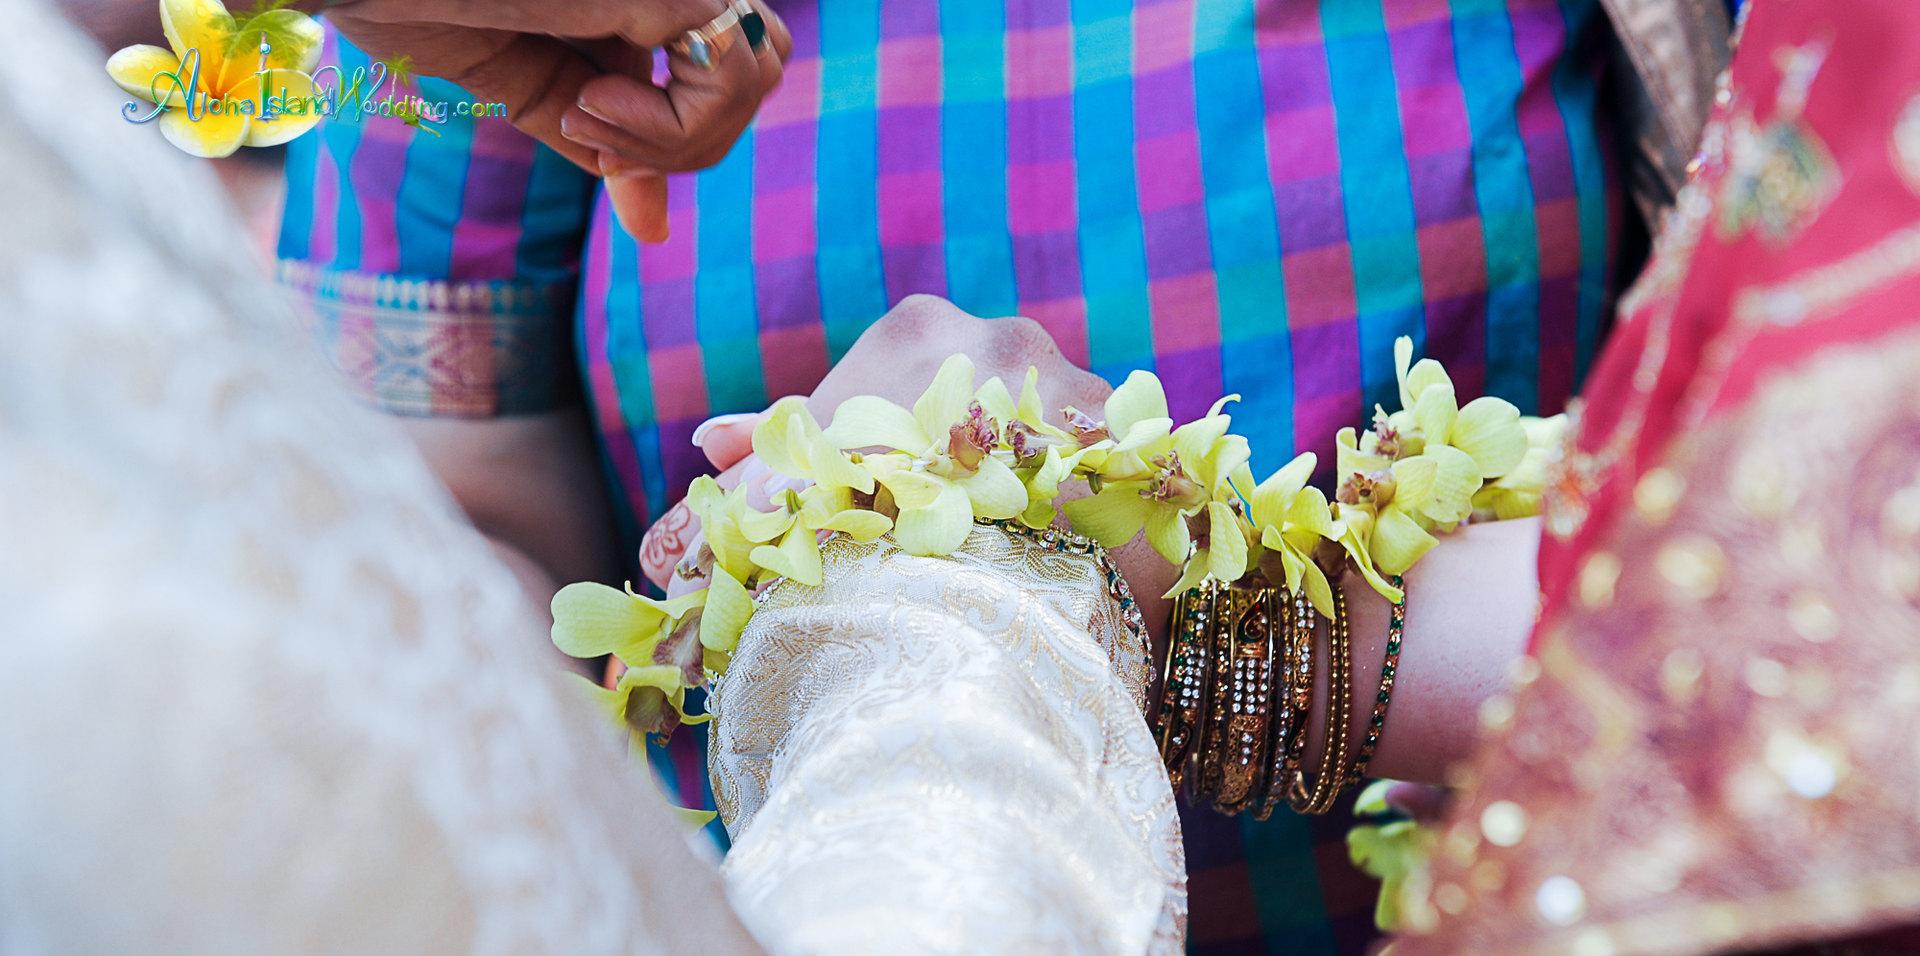 Indian wedding ceremony in hawaii-95.jpg